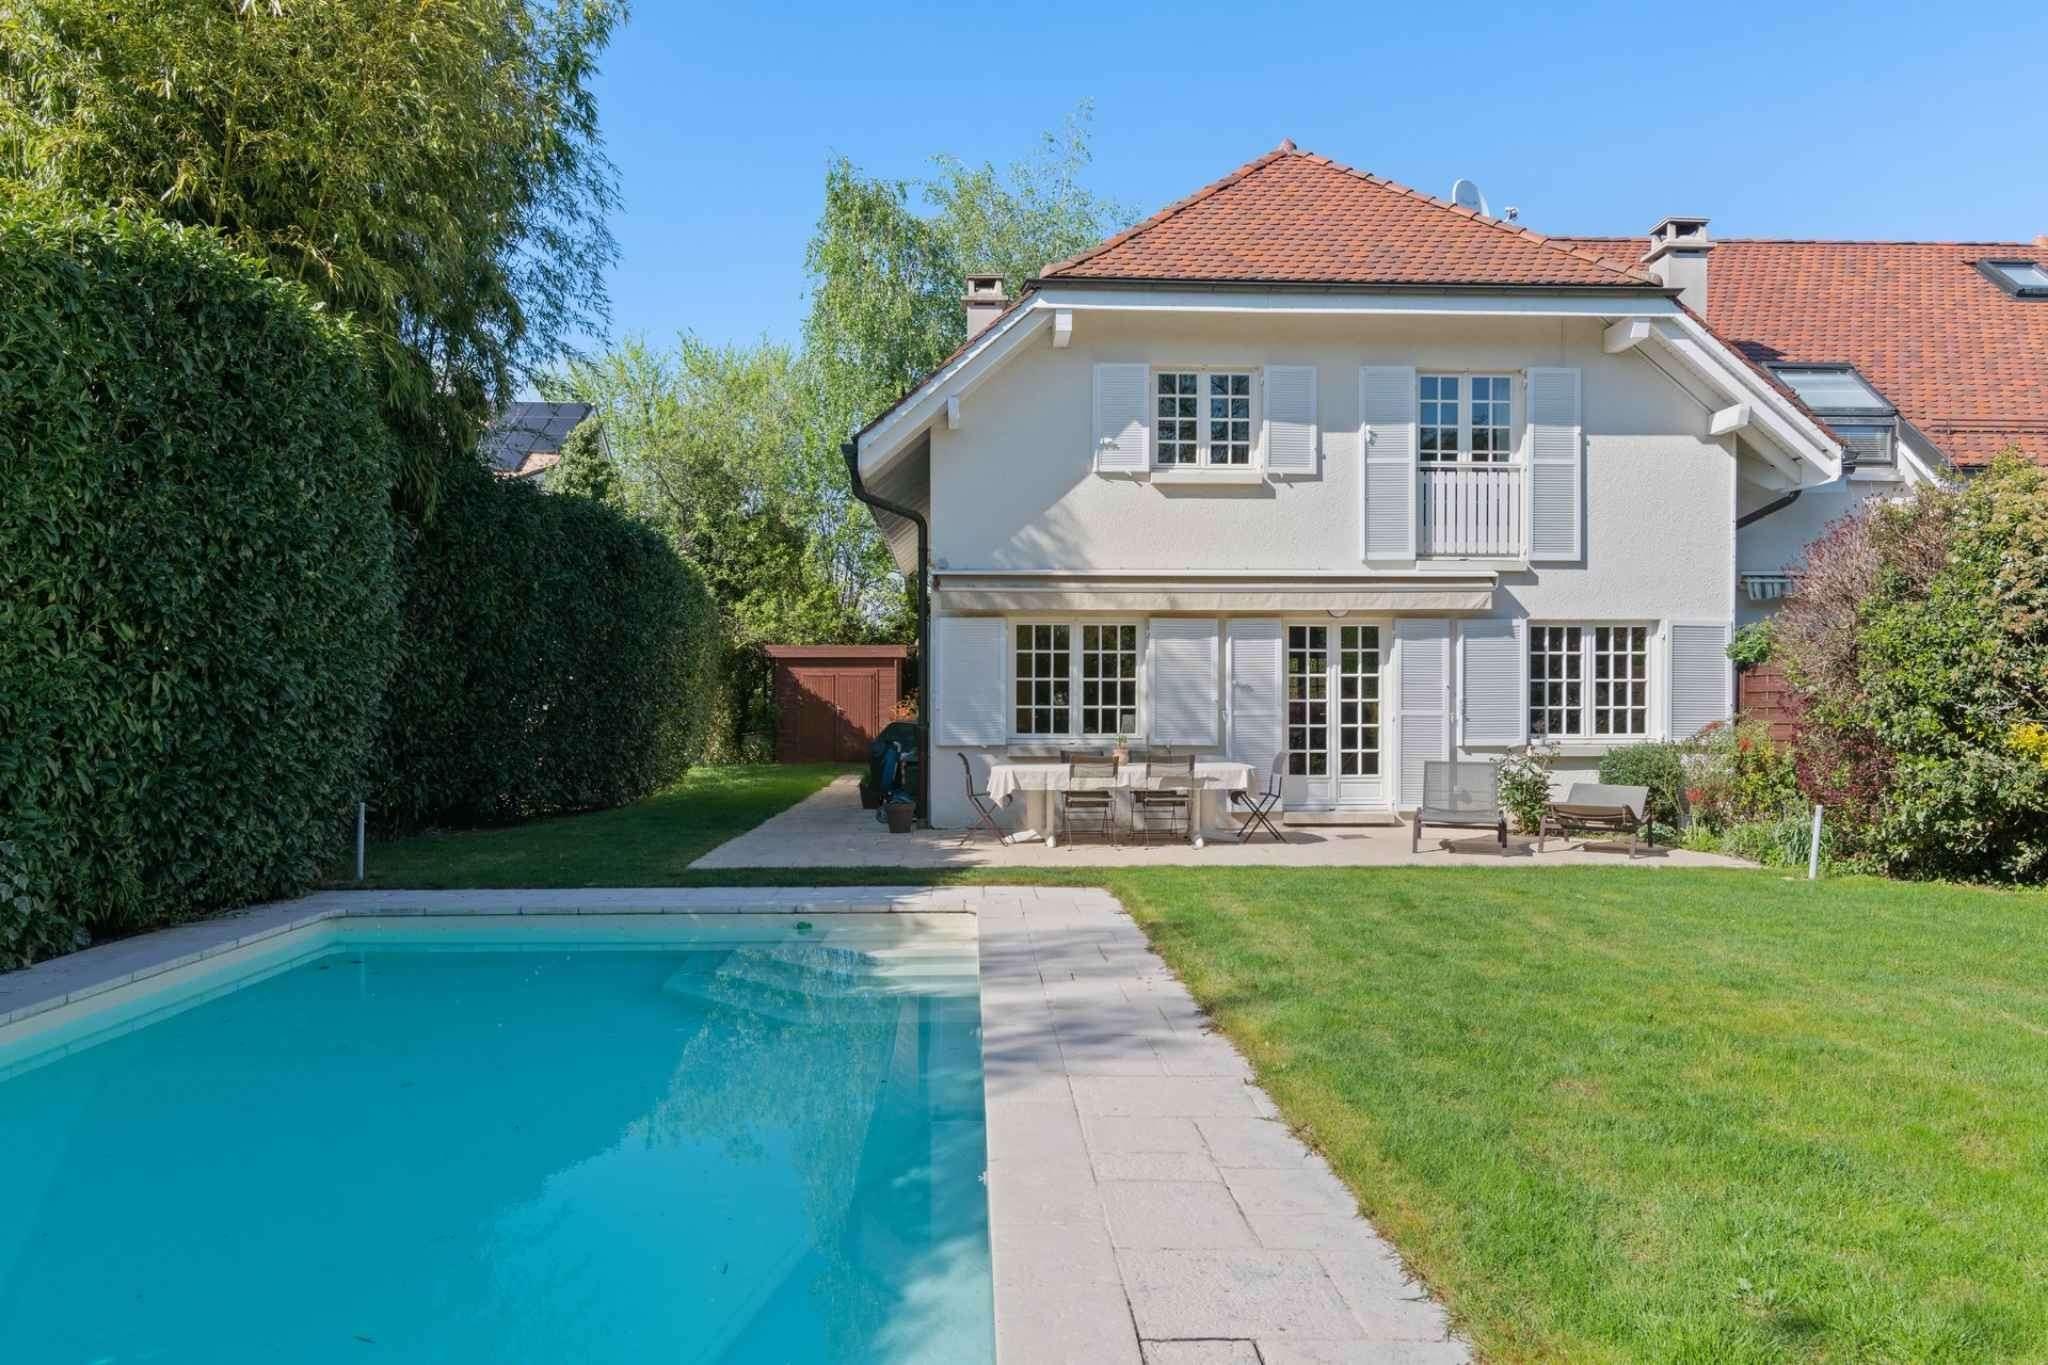 Belle villa mitoyenne avec piscine